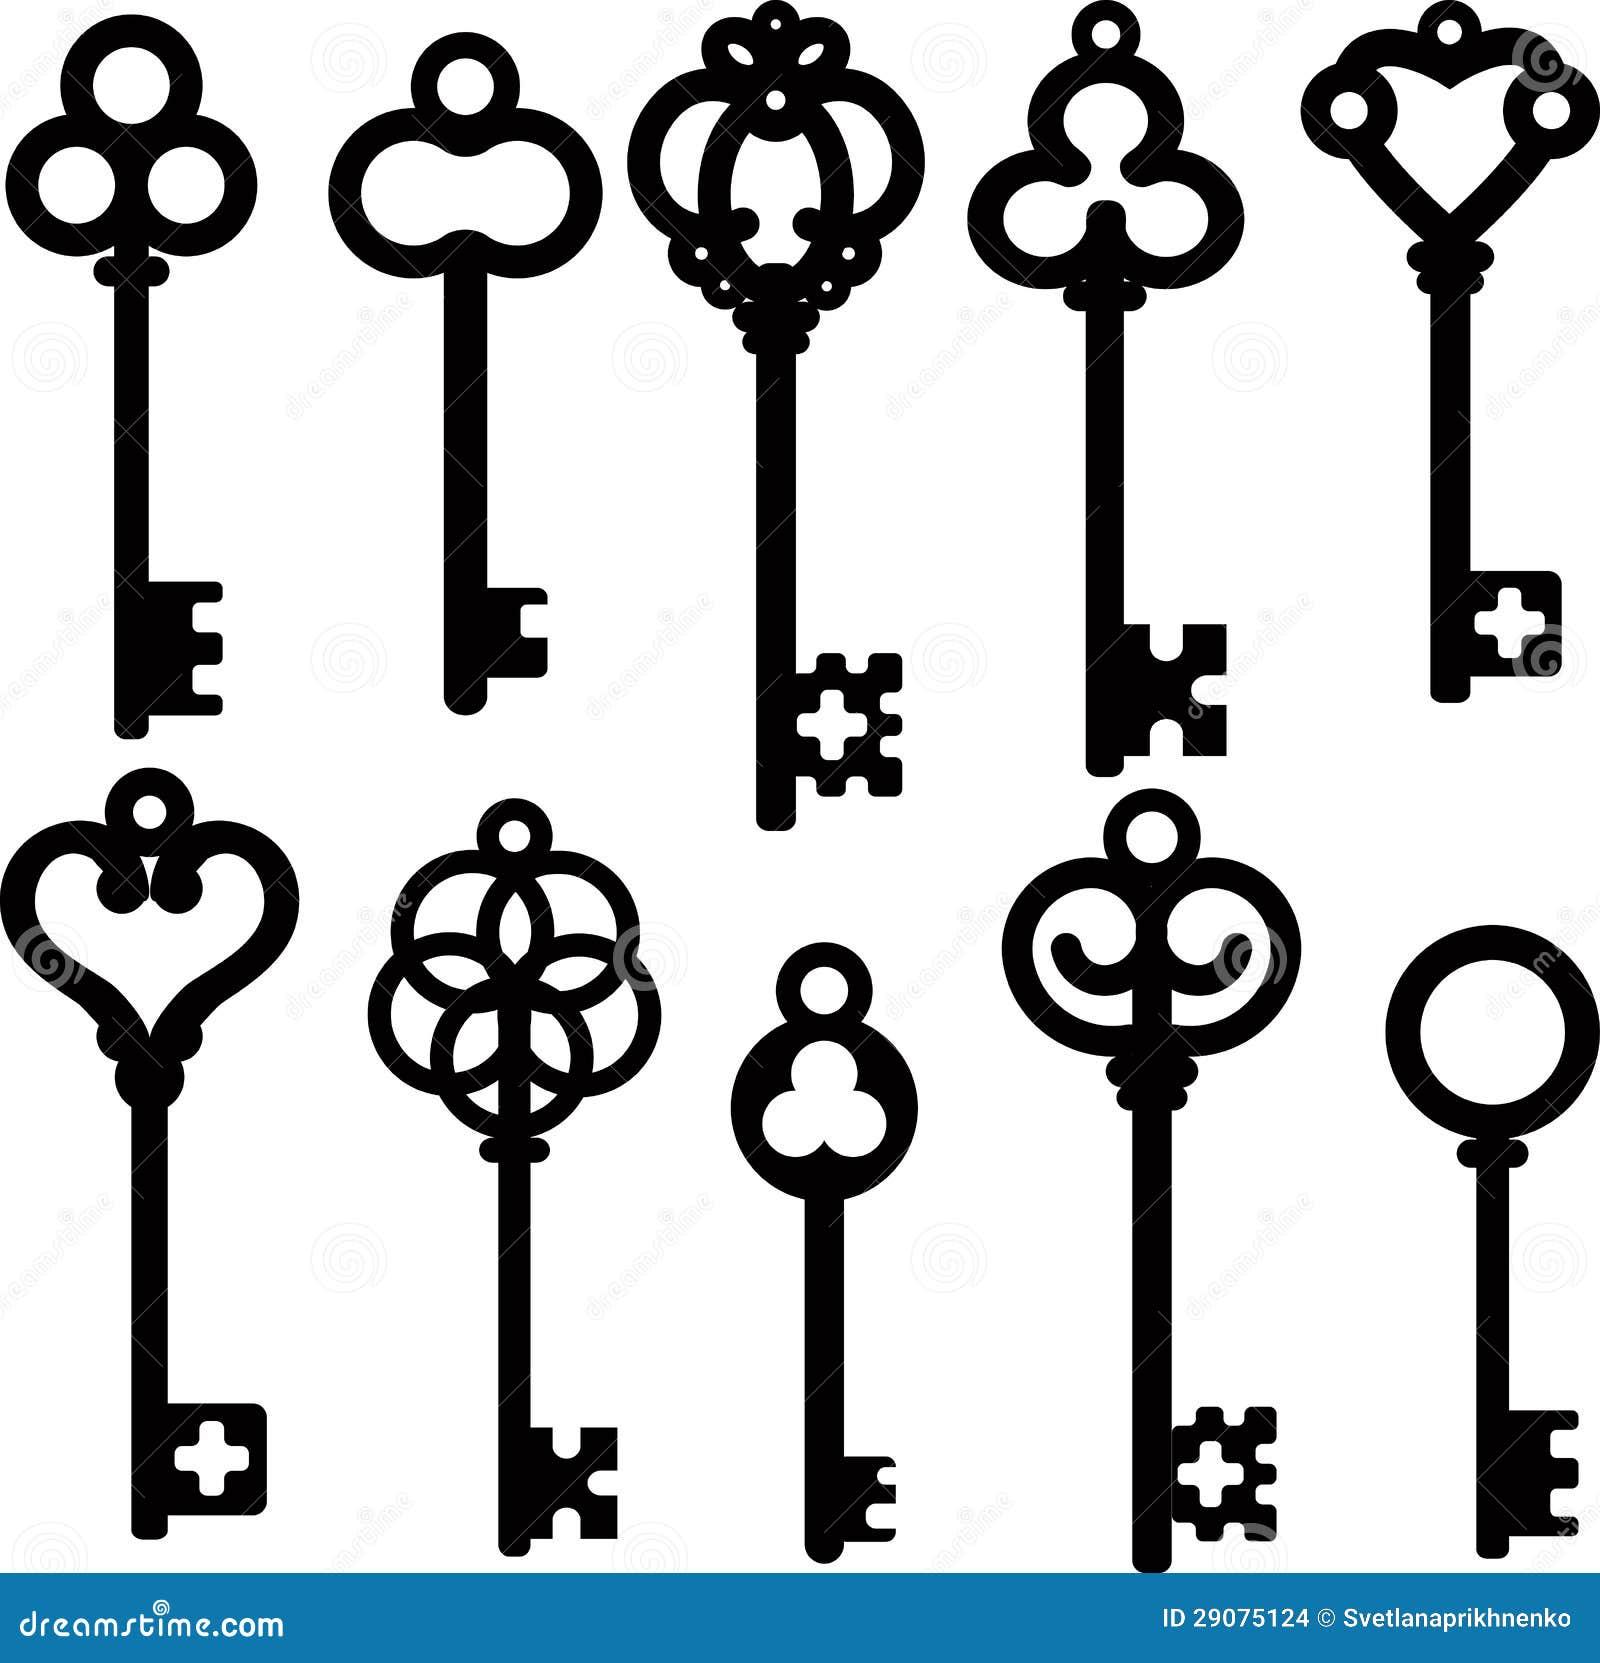 Antique skeleton keys stock photo. Image of metal, old ...